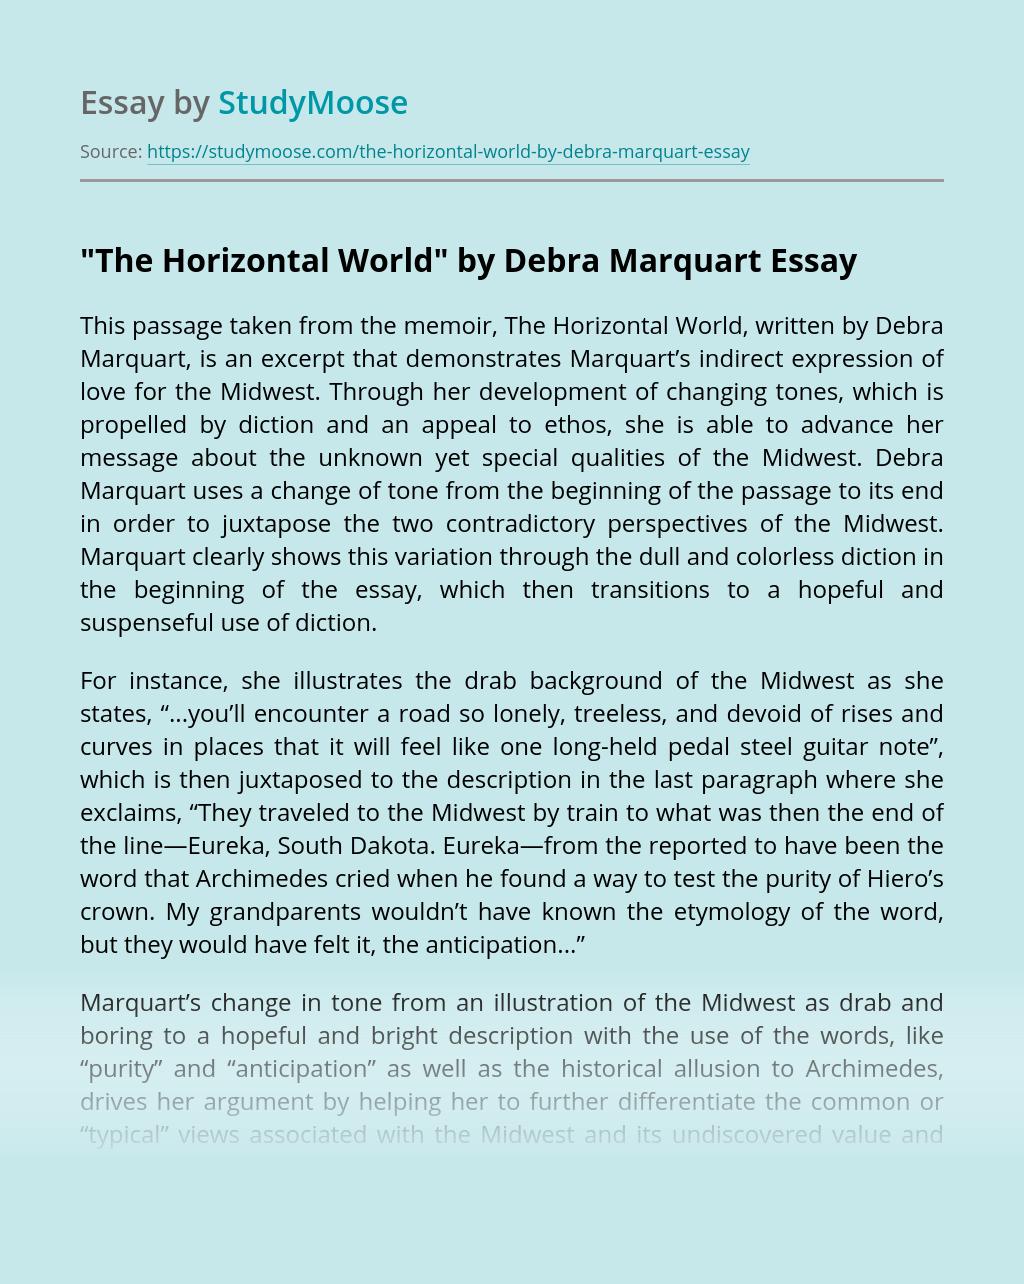 """The Horizontal World"" by Debra Marquart"